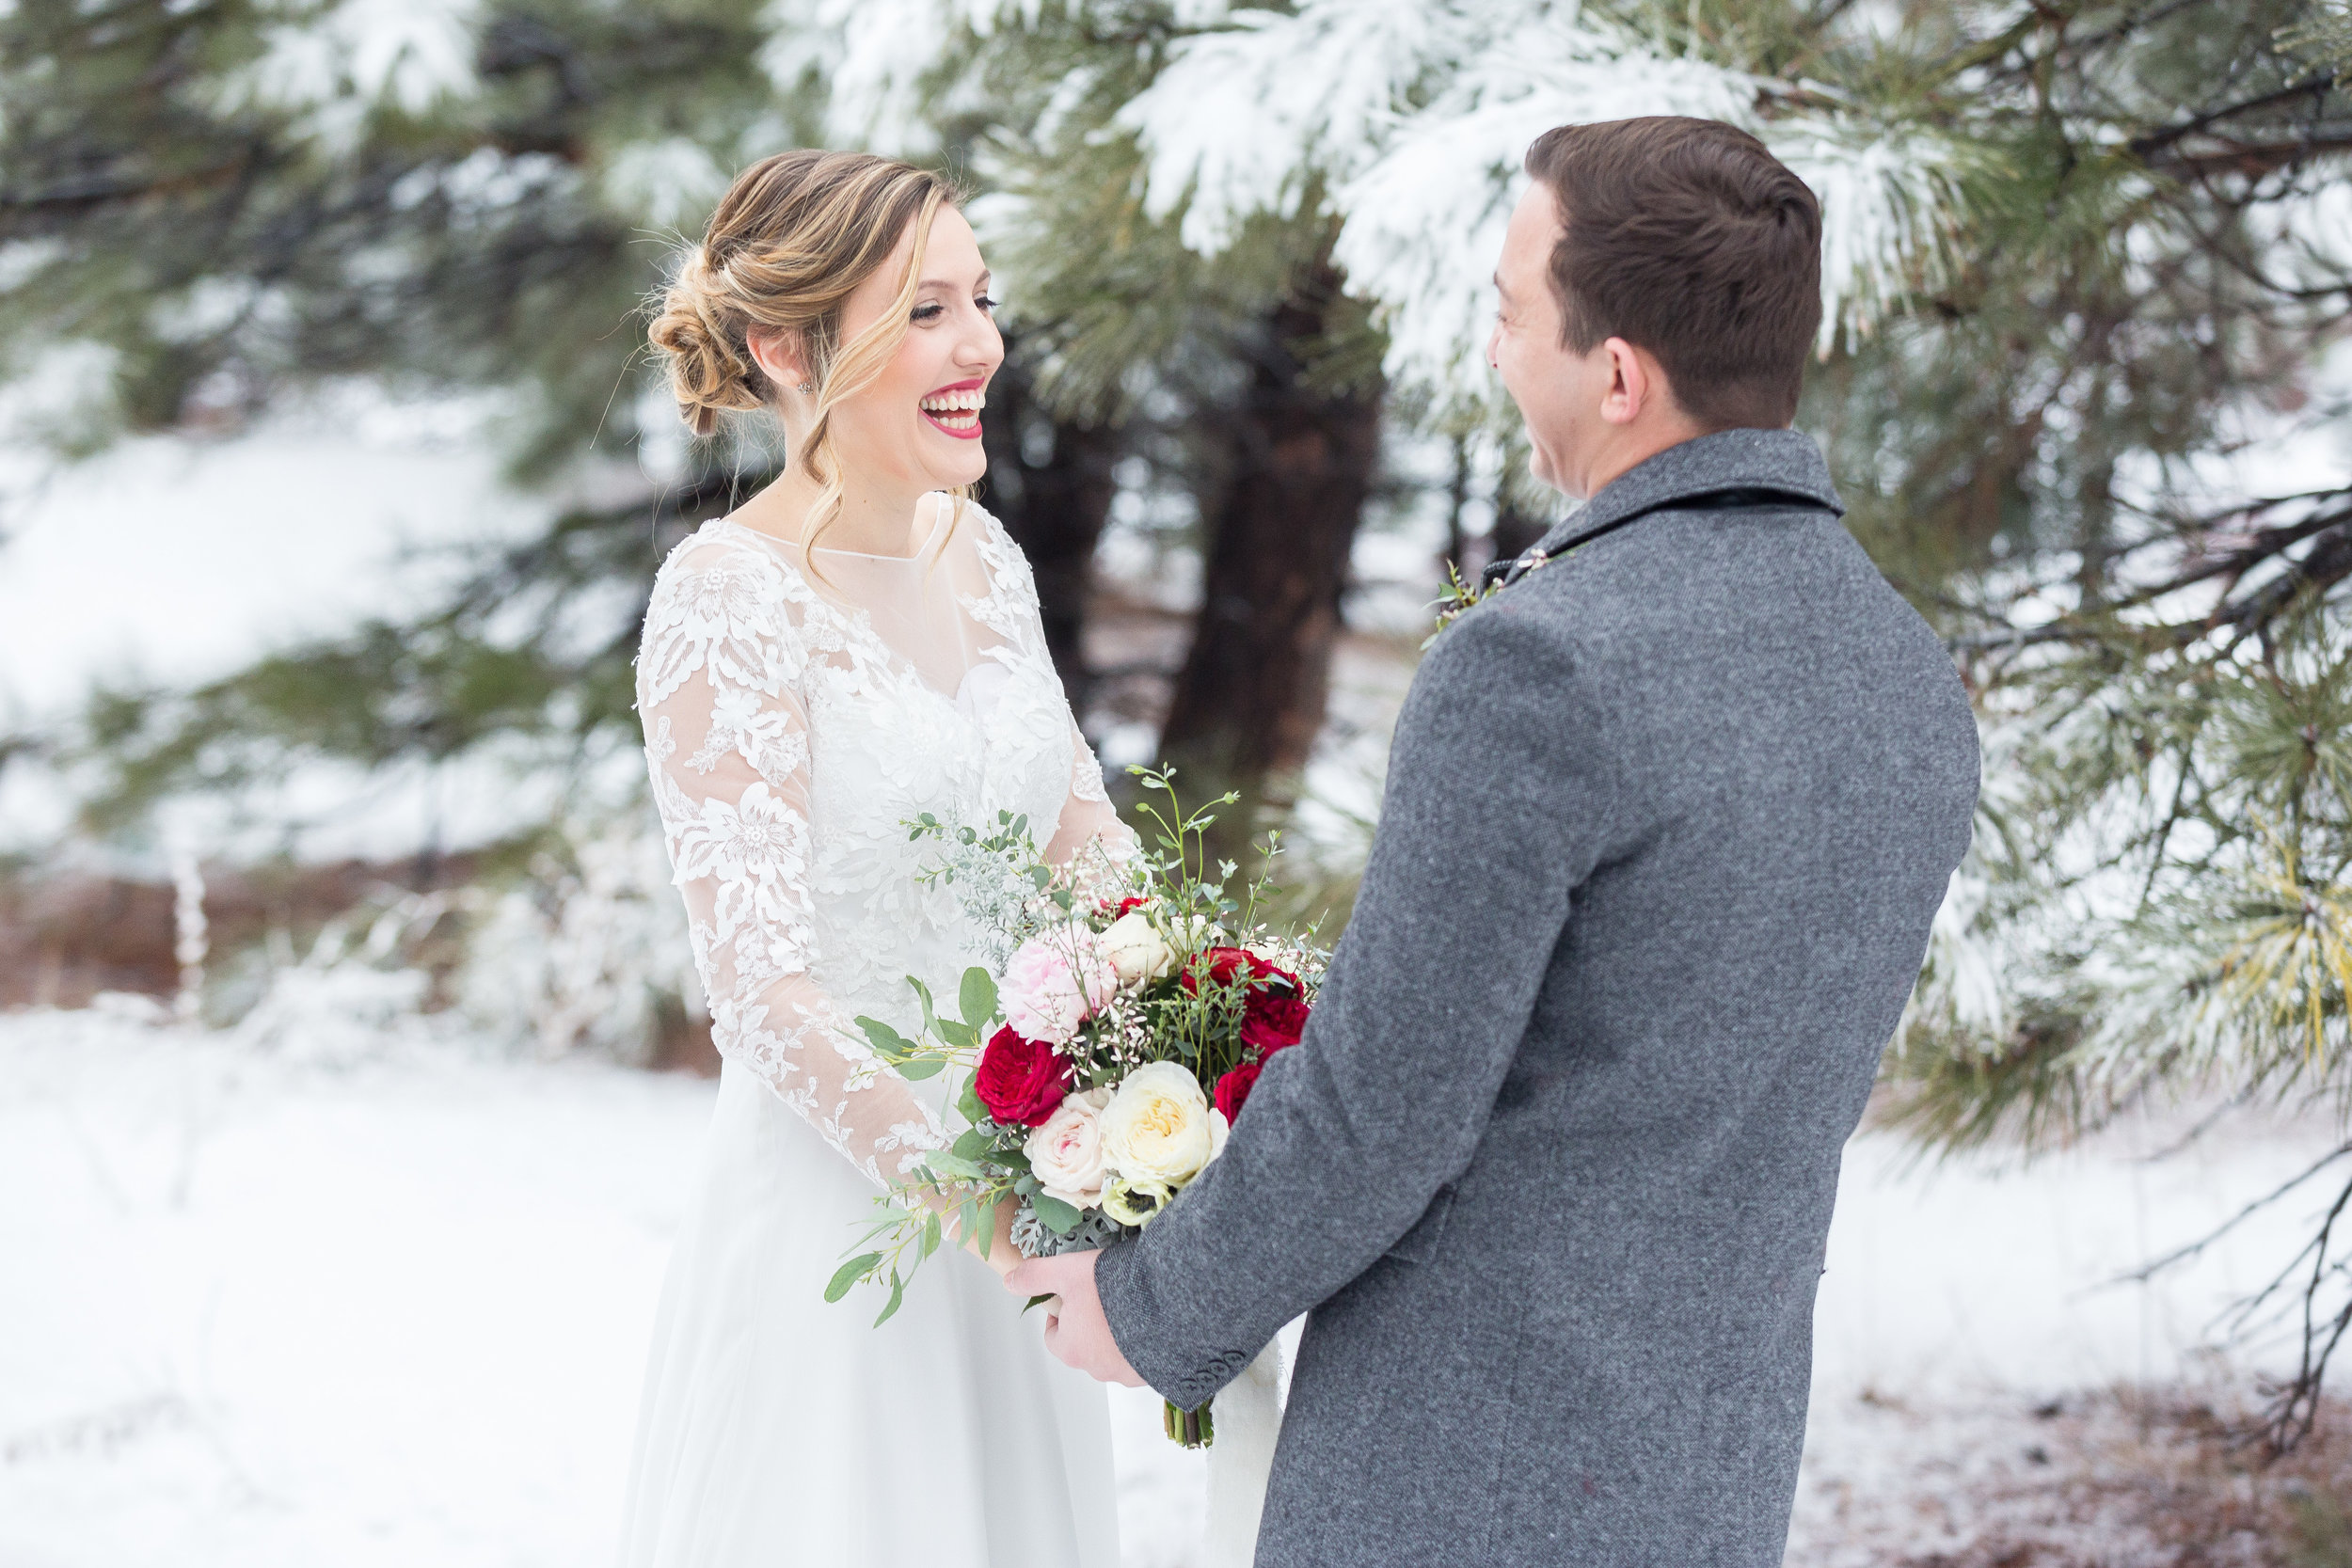 winter-wedding-first-look-jessica-gabe-karlee-k-photography.jpg